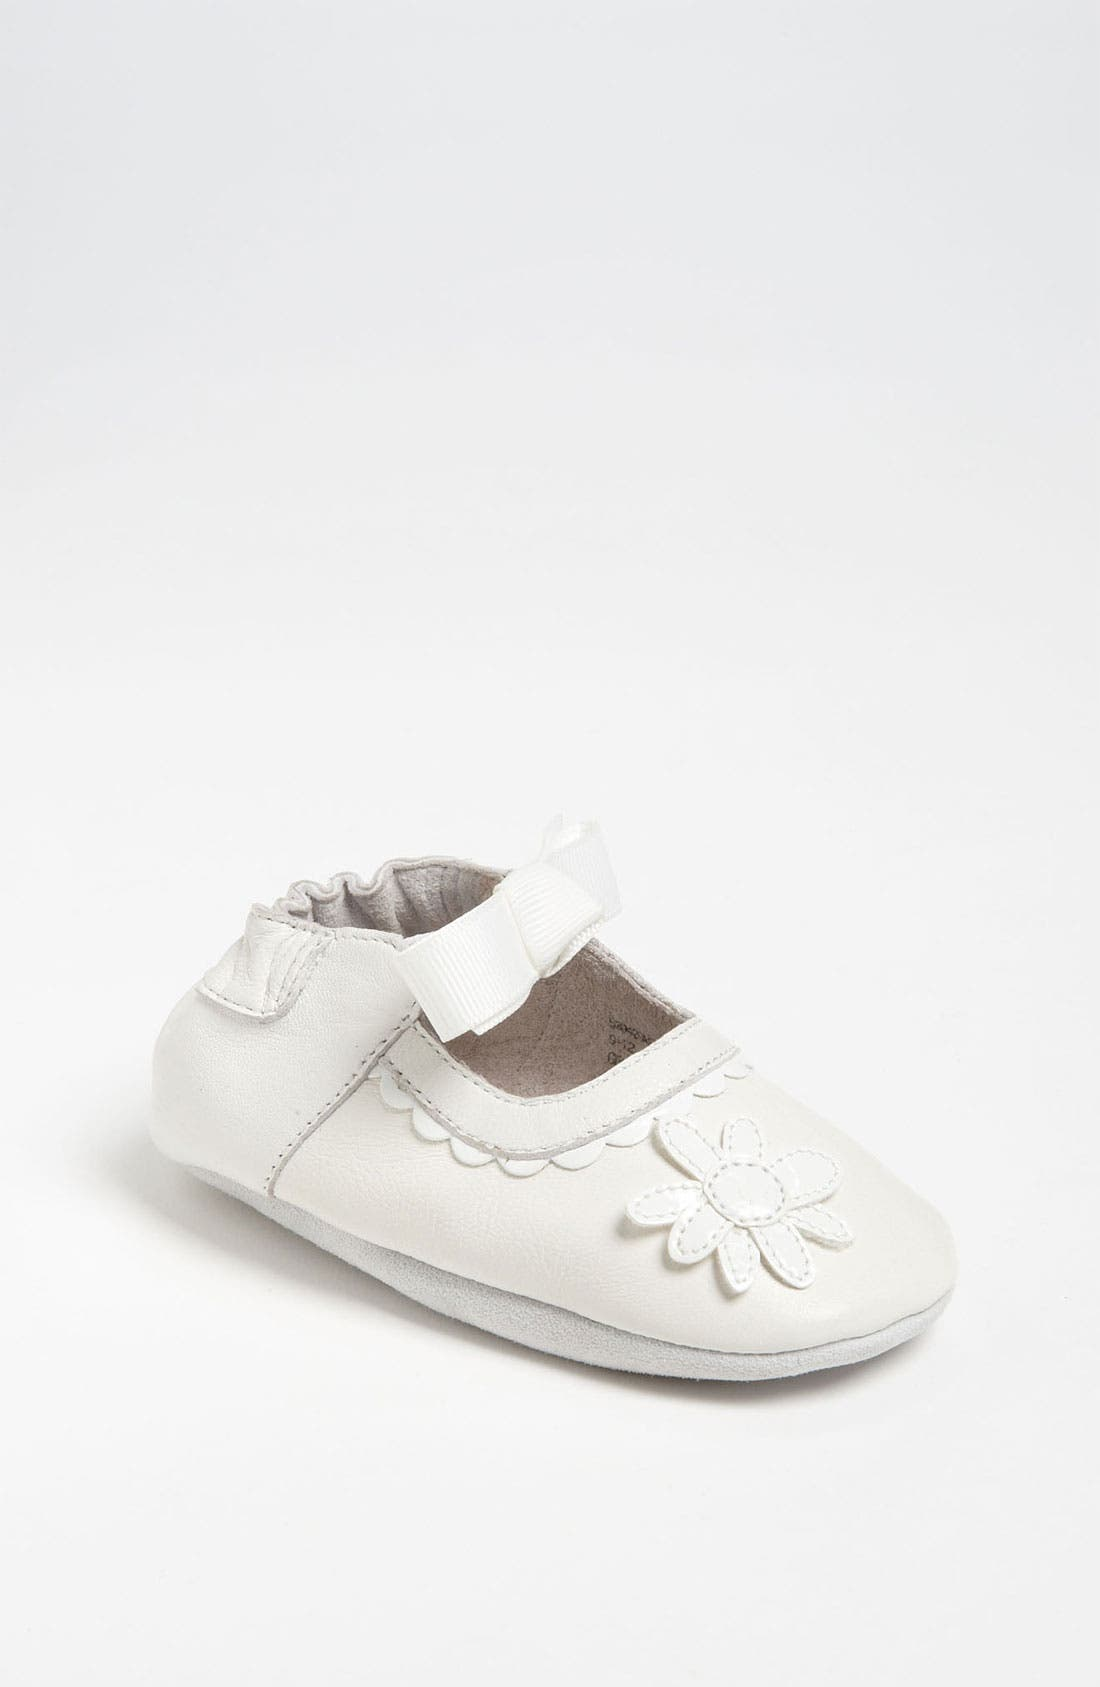 Main Image - Nordstrom Baby 'Daisy' Crib Shoe (Infant)